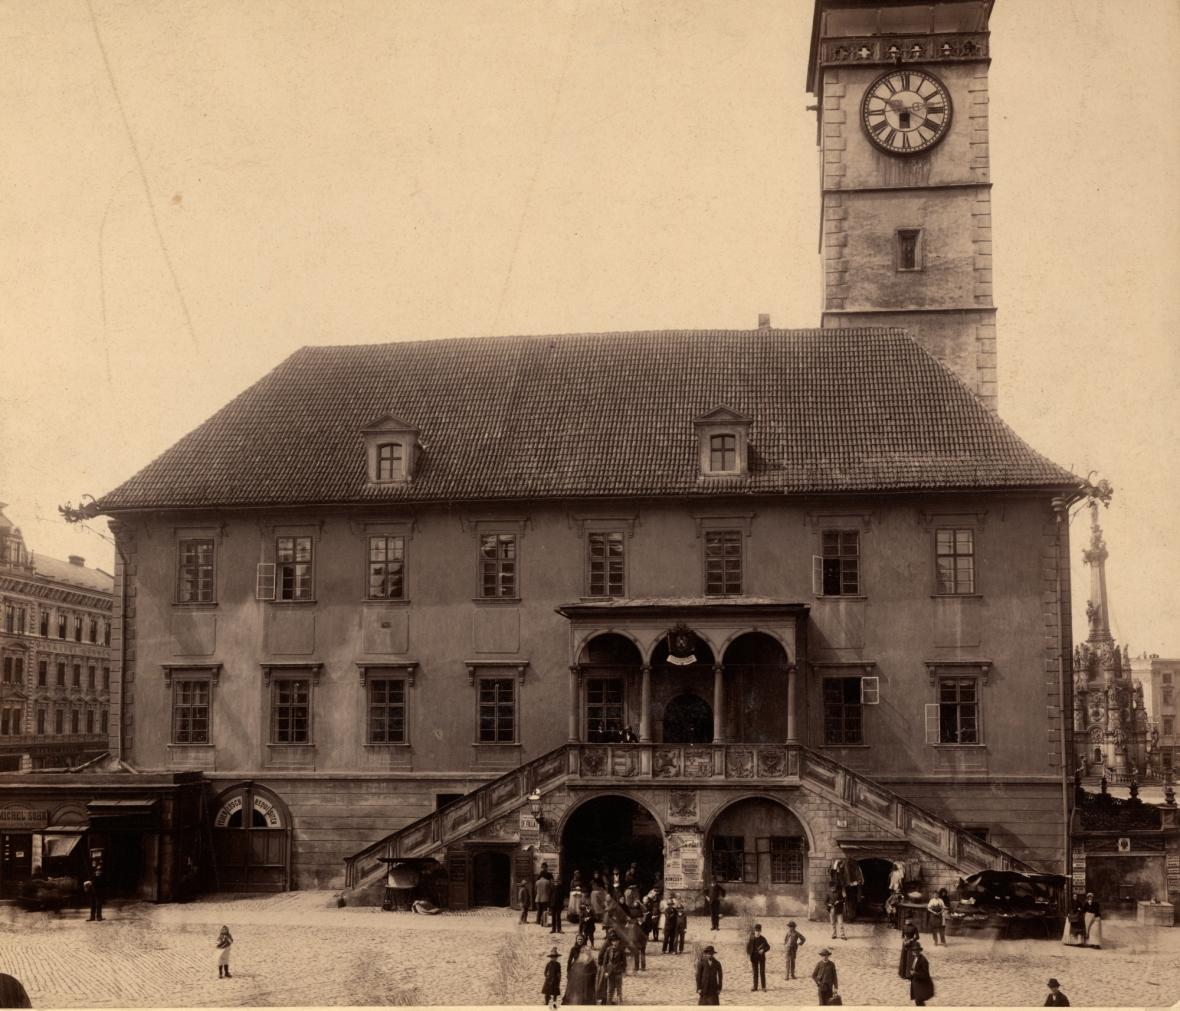 Olomoucká radnice 1890 - 1900